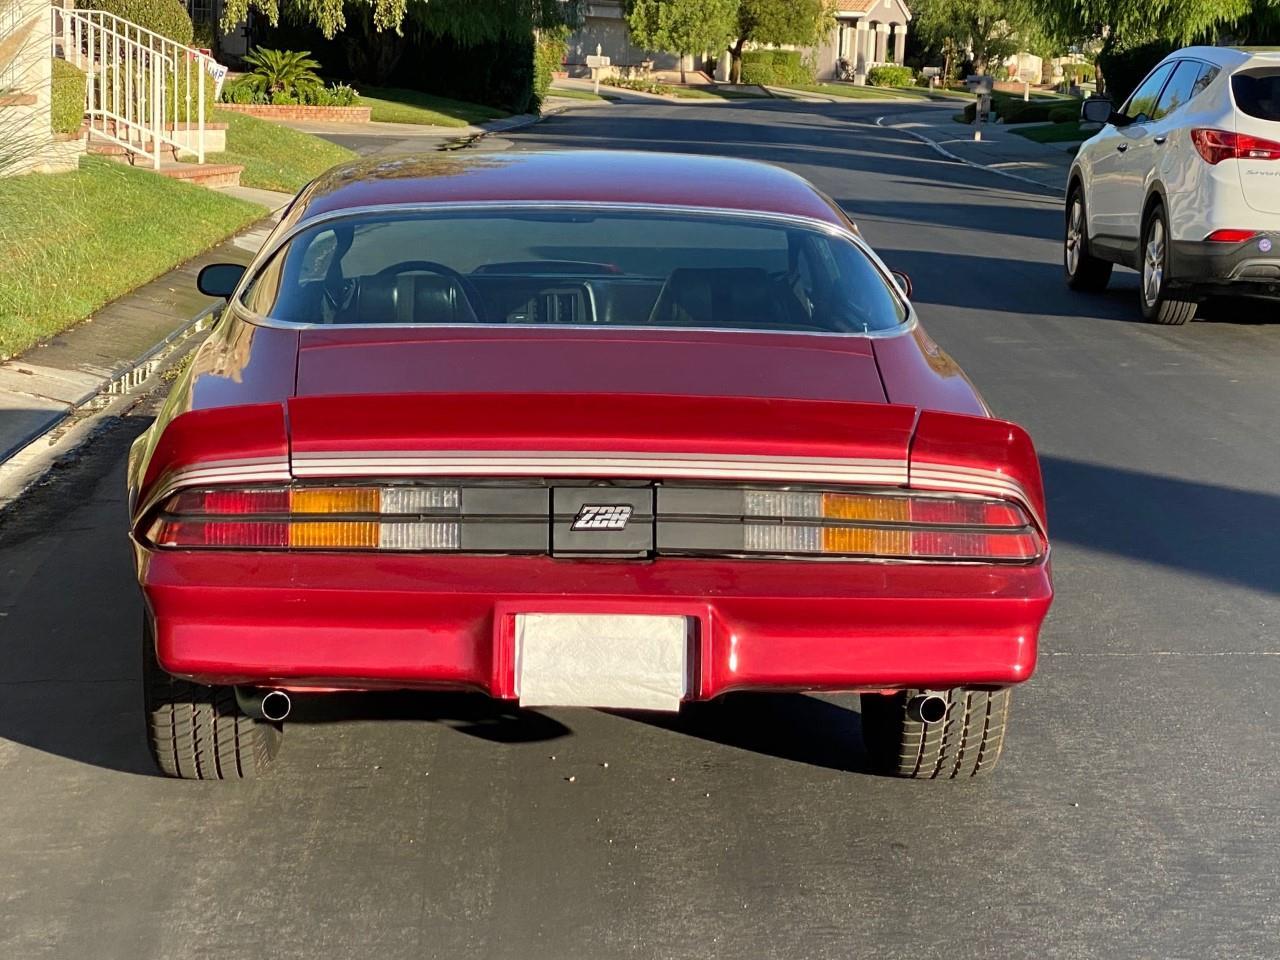 1980 Chevrolet Camaro Z28 (CC-1413921) for sale in Banning, California